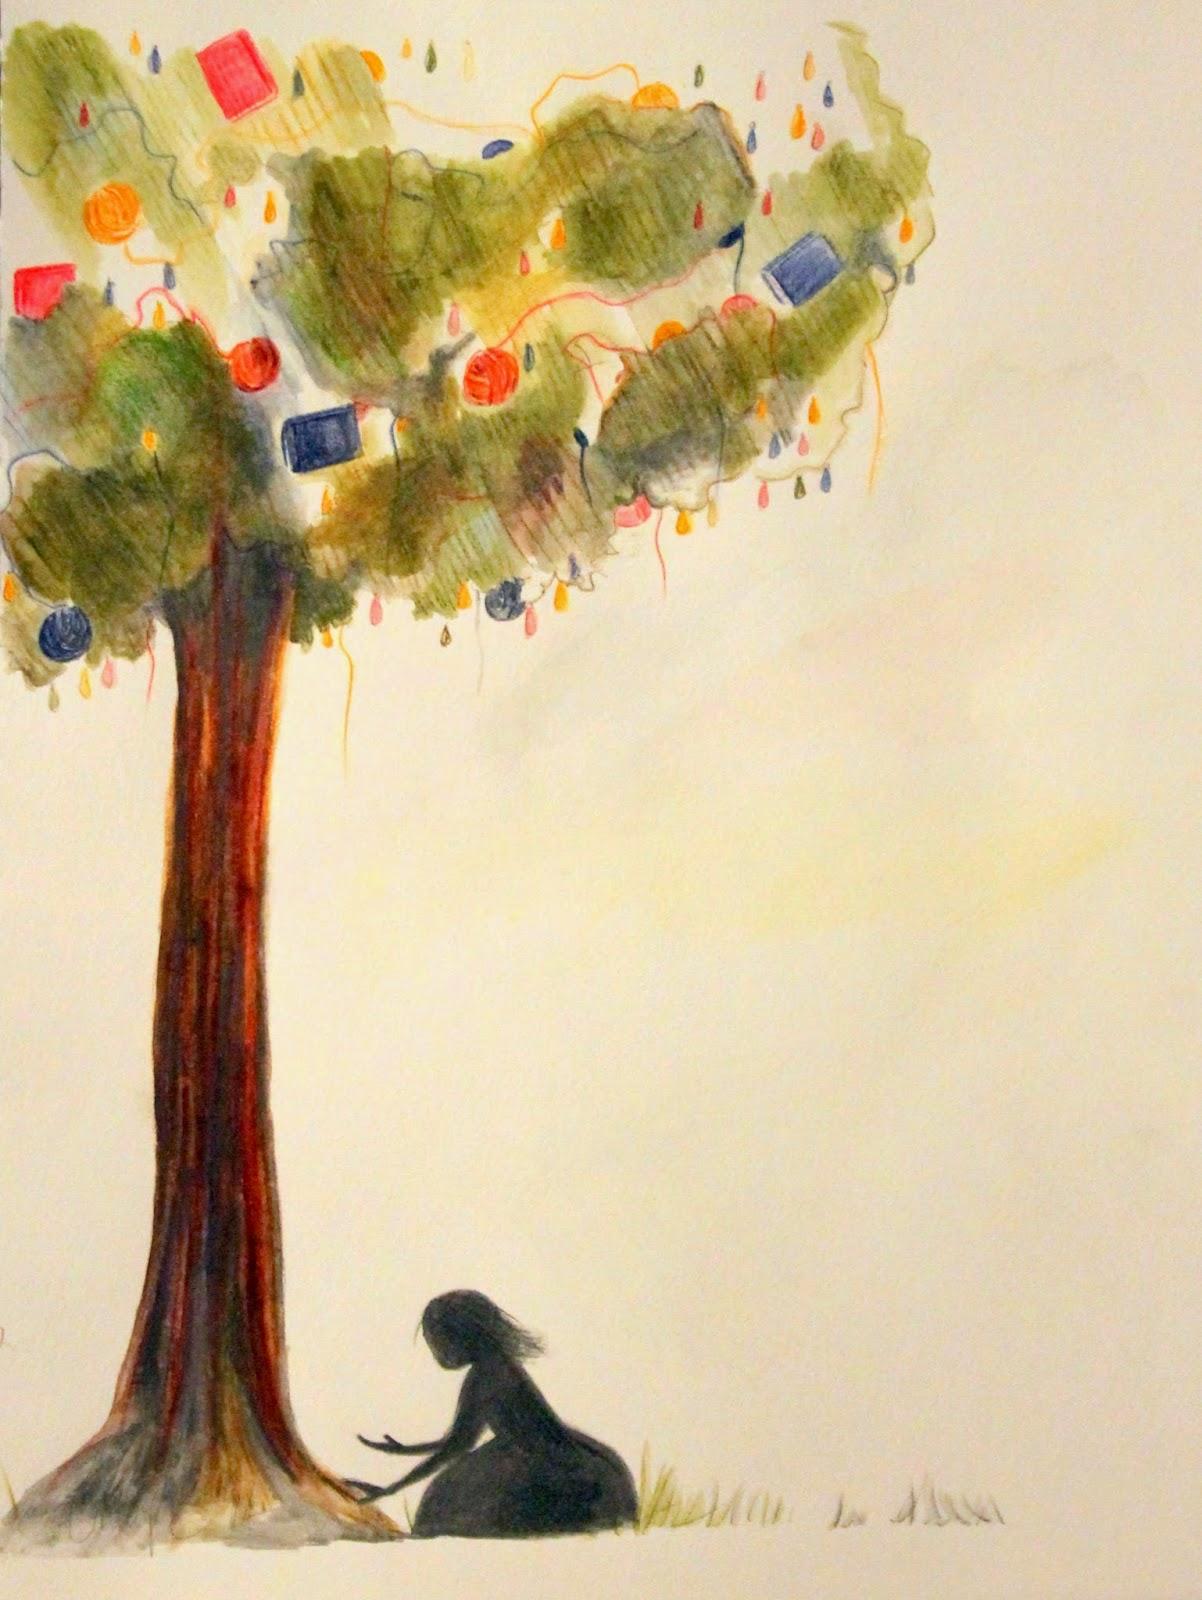 Book and yarn tree silhouette girl